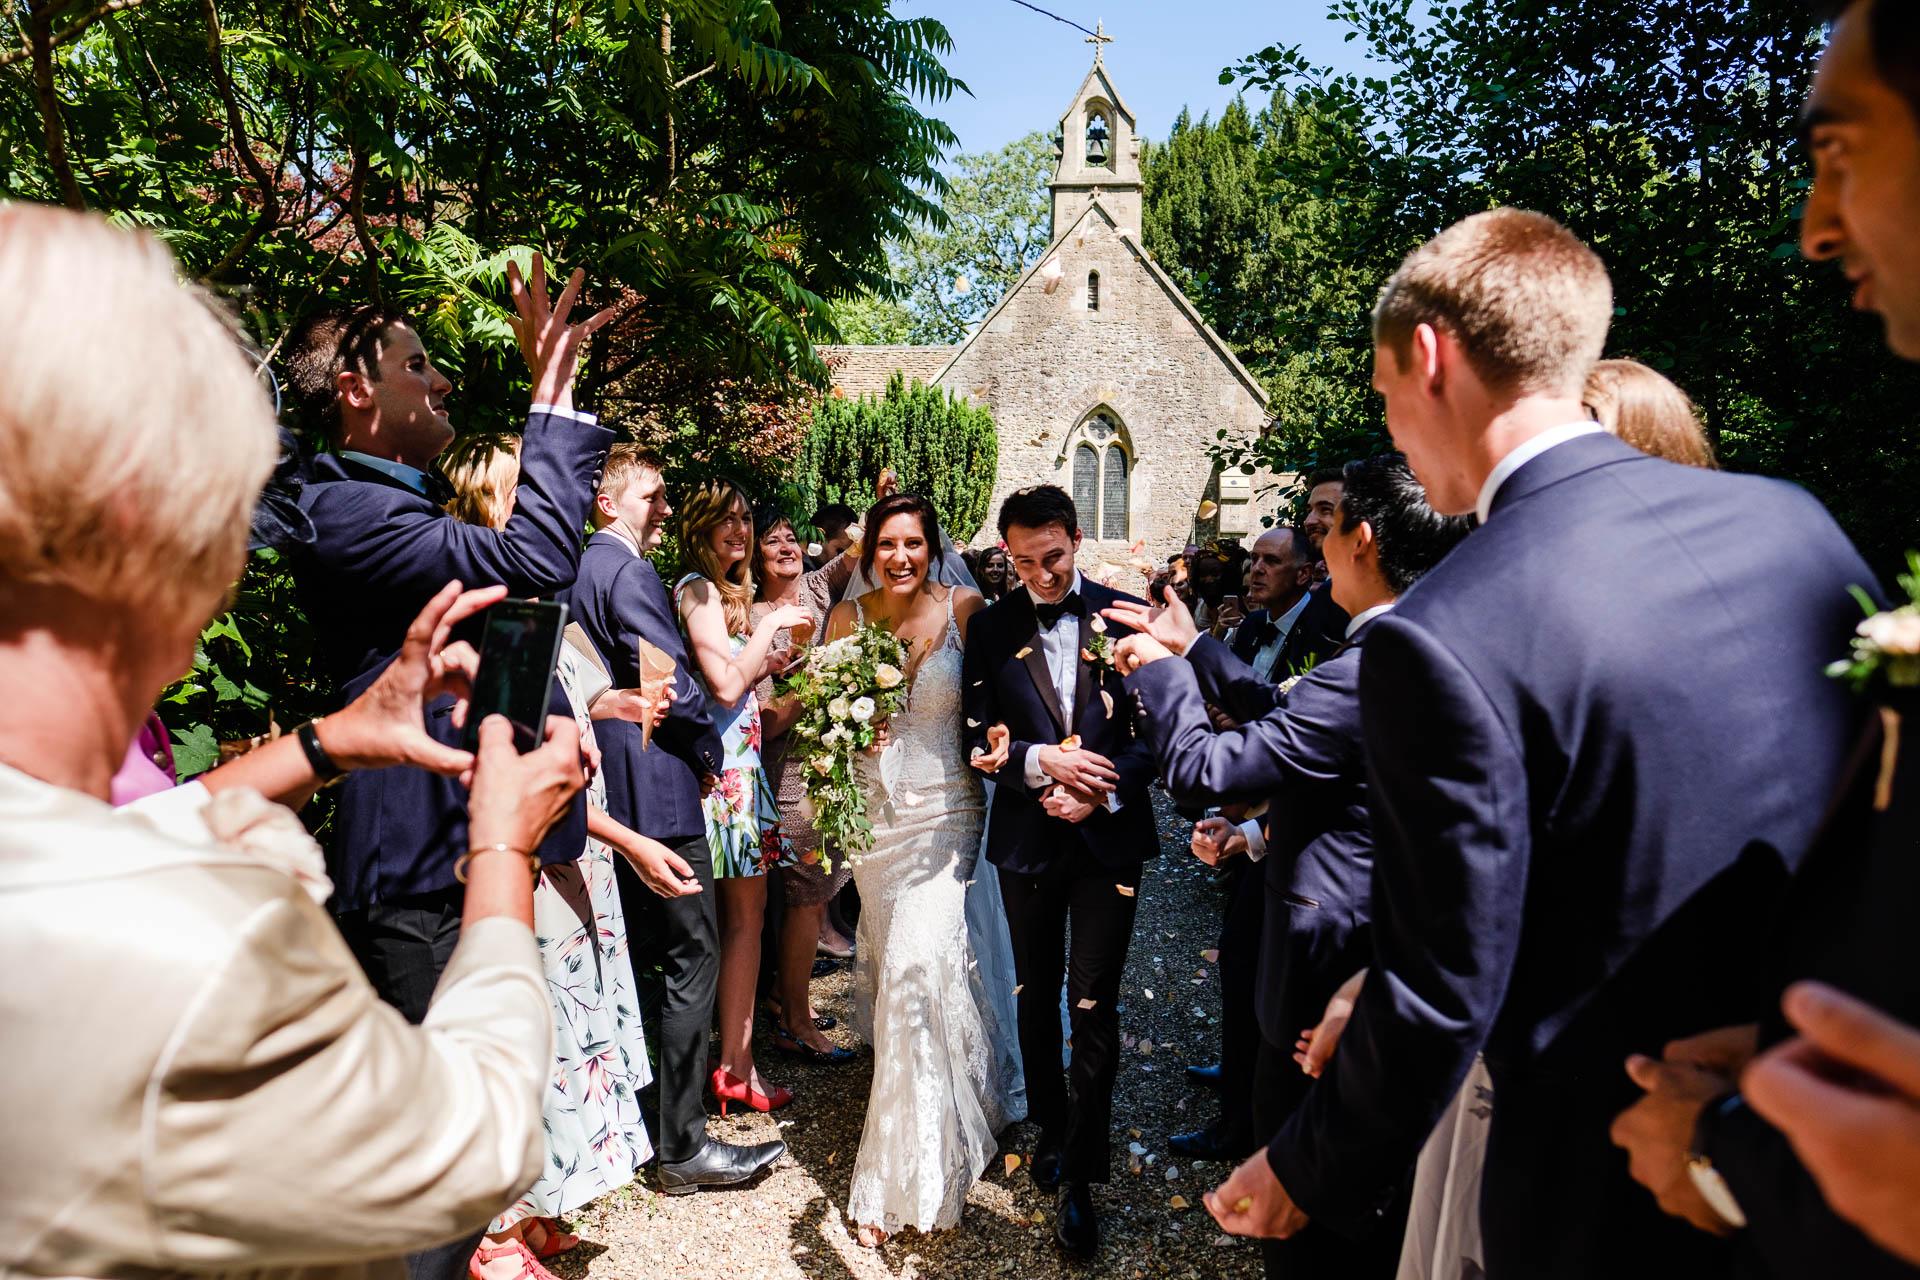 orchardleigh house wedding - Danni & Barney (206).jpg